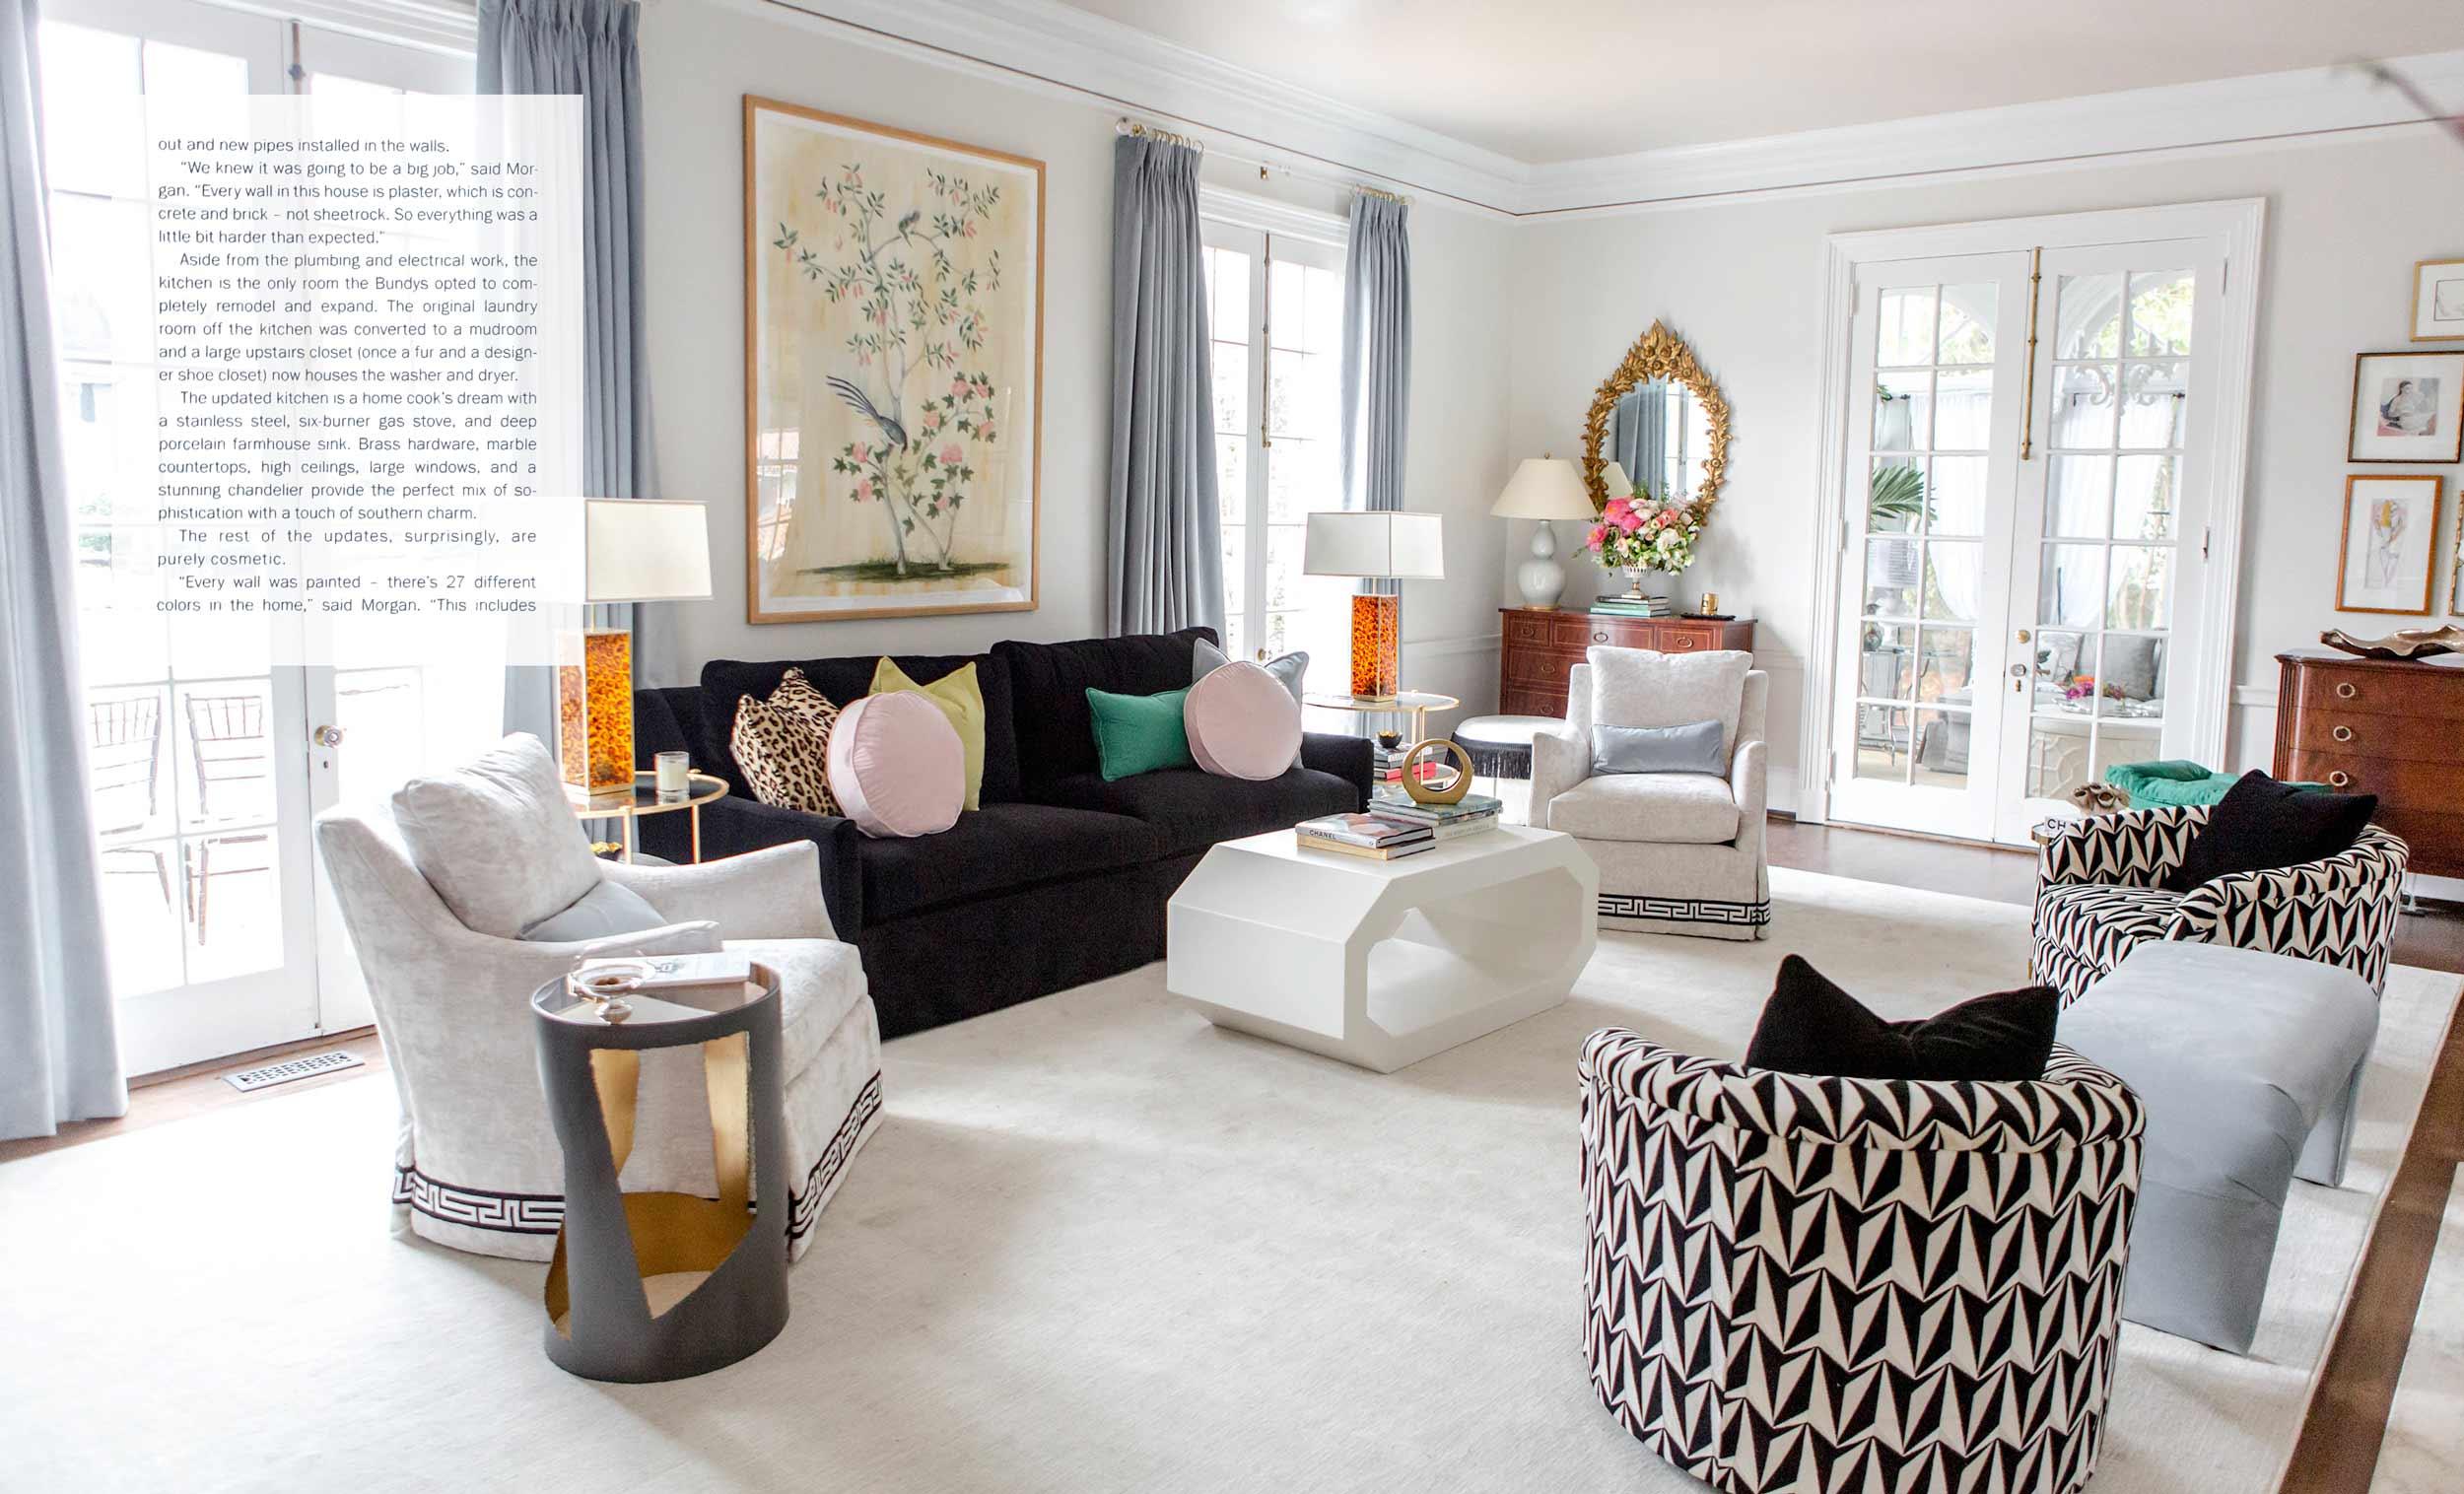 Brittany_Cason_Interior_Design_Augusta_Magazine_Southern_Designer_Showhouse_and_Gardens_4.jpg